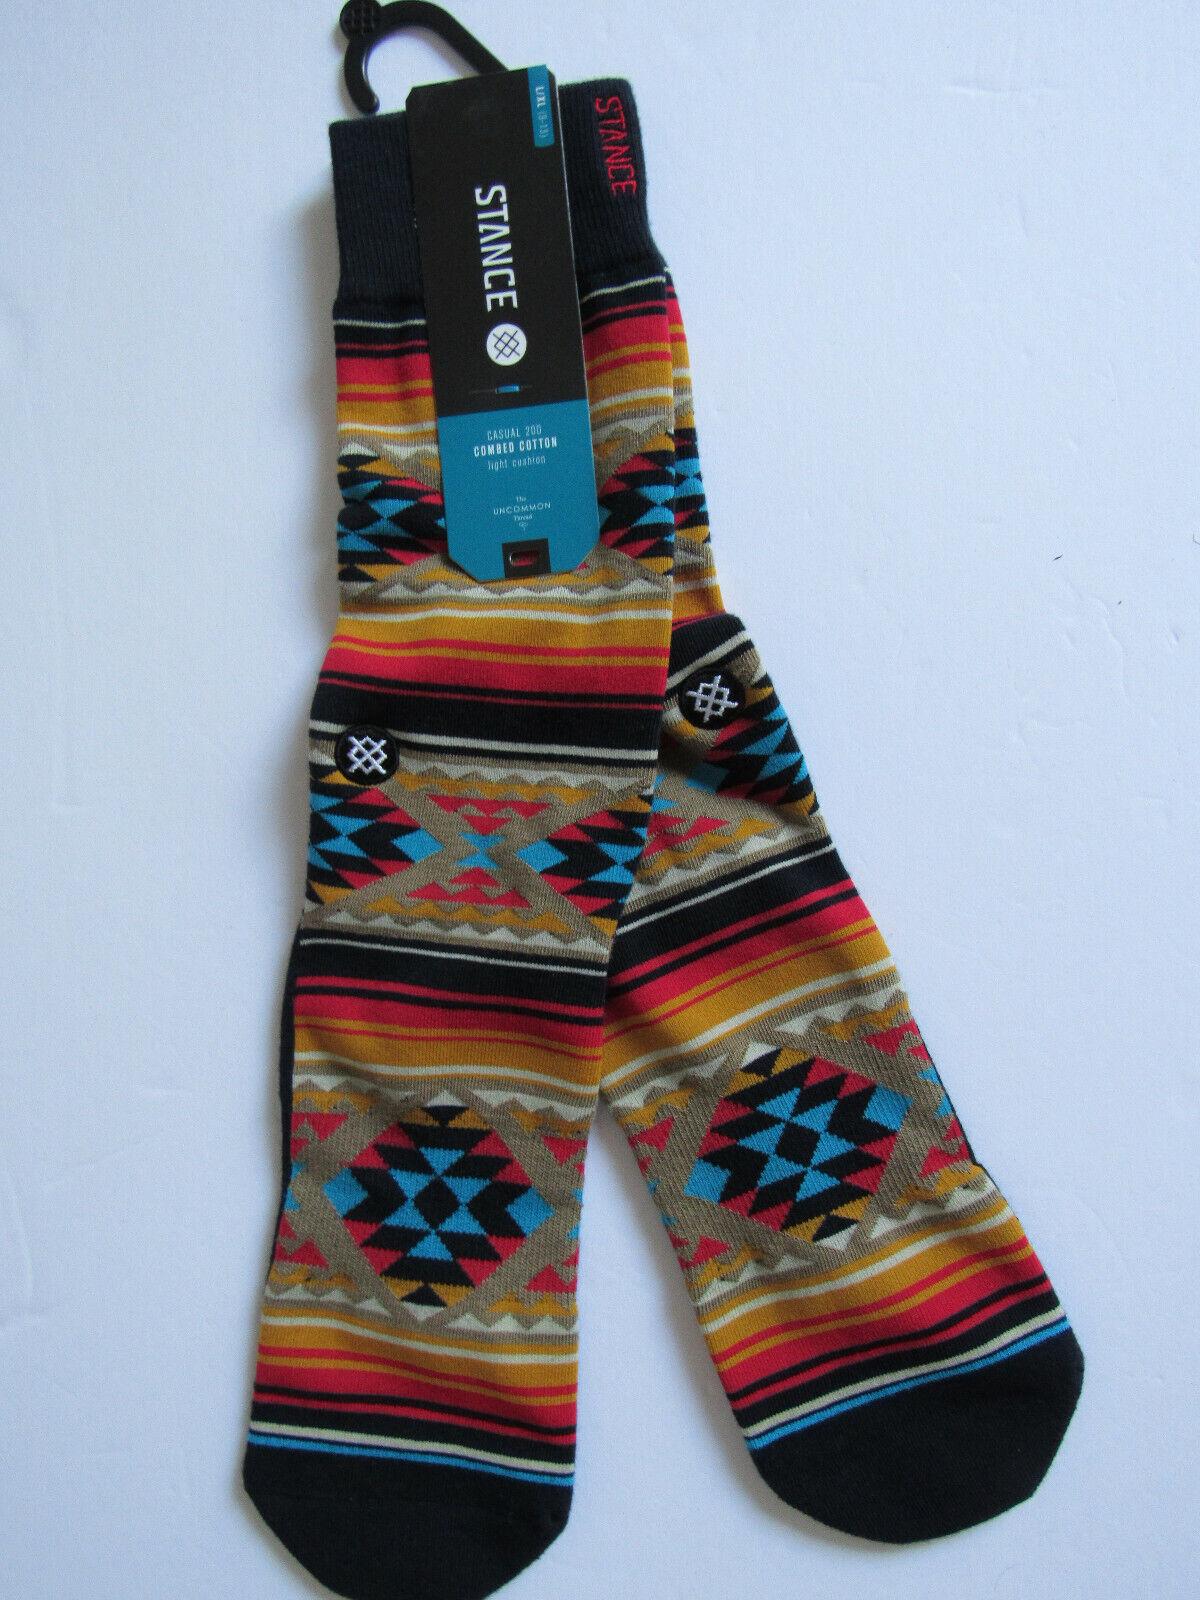 Stance Combed Cotton Light Cushion Socks Mens  L/XL NWT Owen